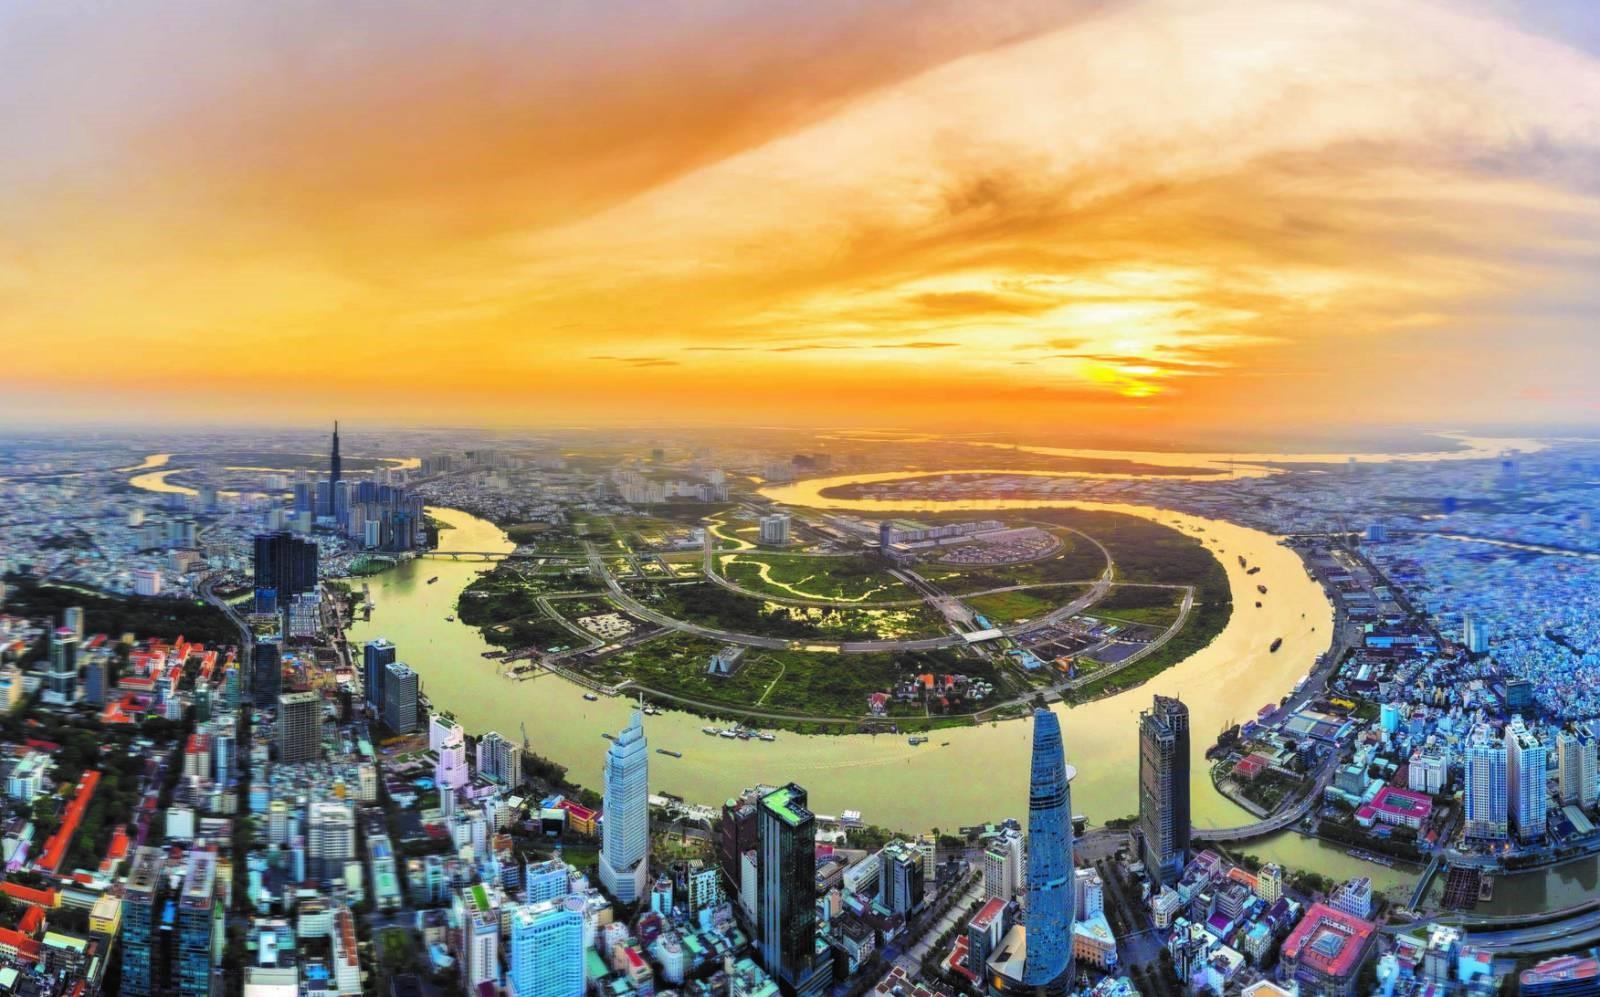 The city of tomorrow in Saigon